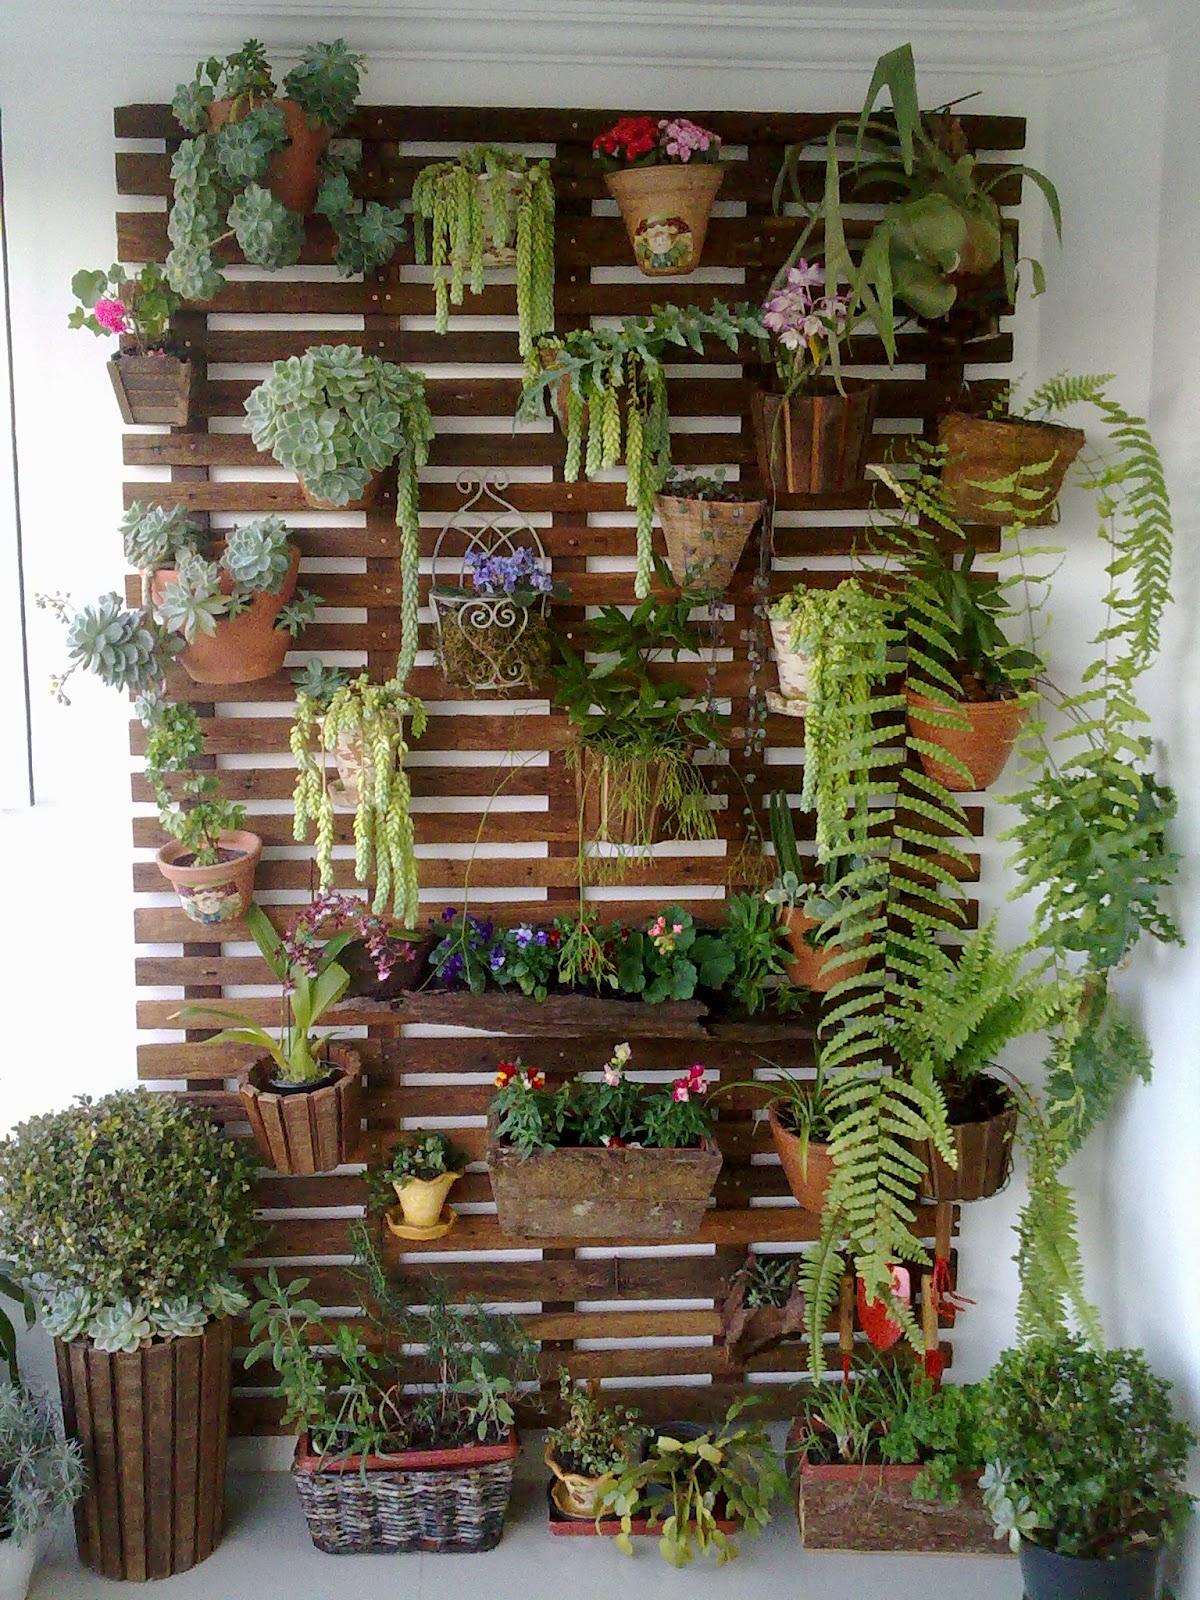 jardim vertical para varanda de apartamento:Vertical Wall Garden Design